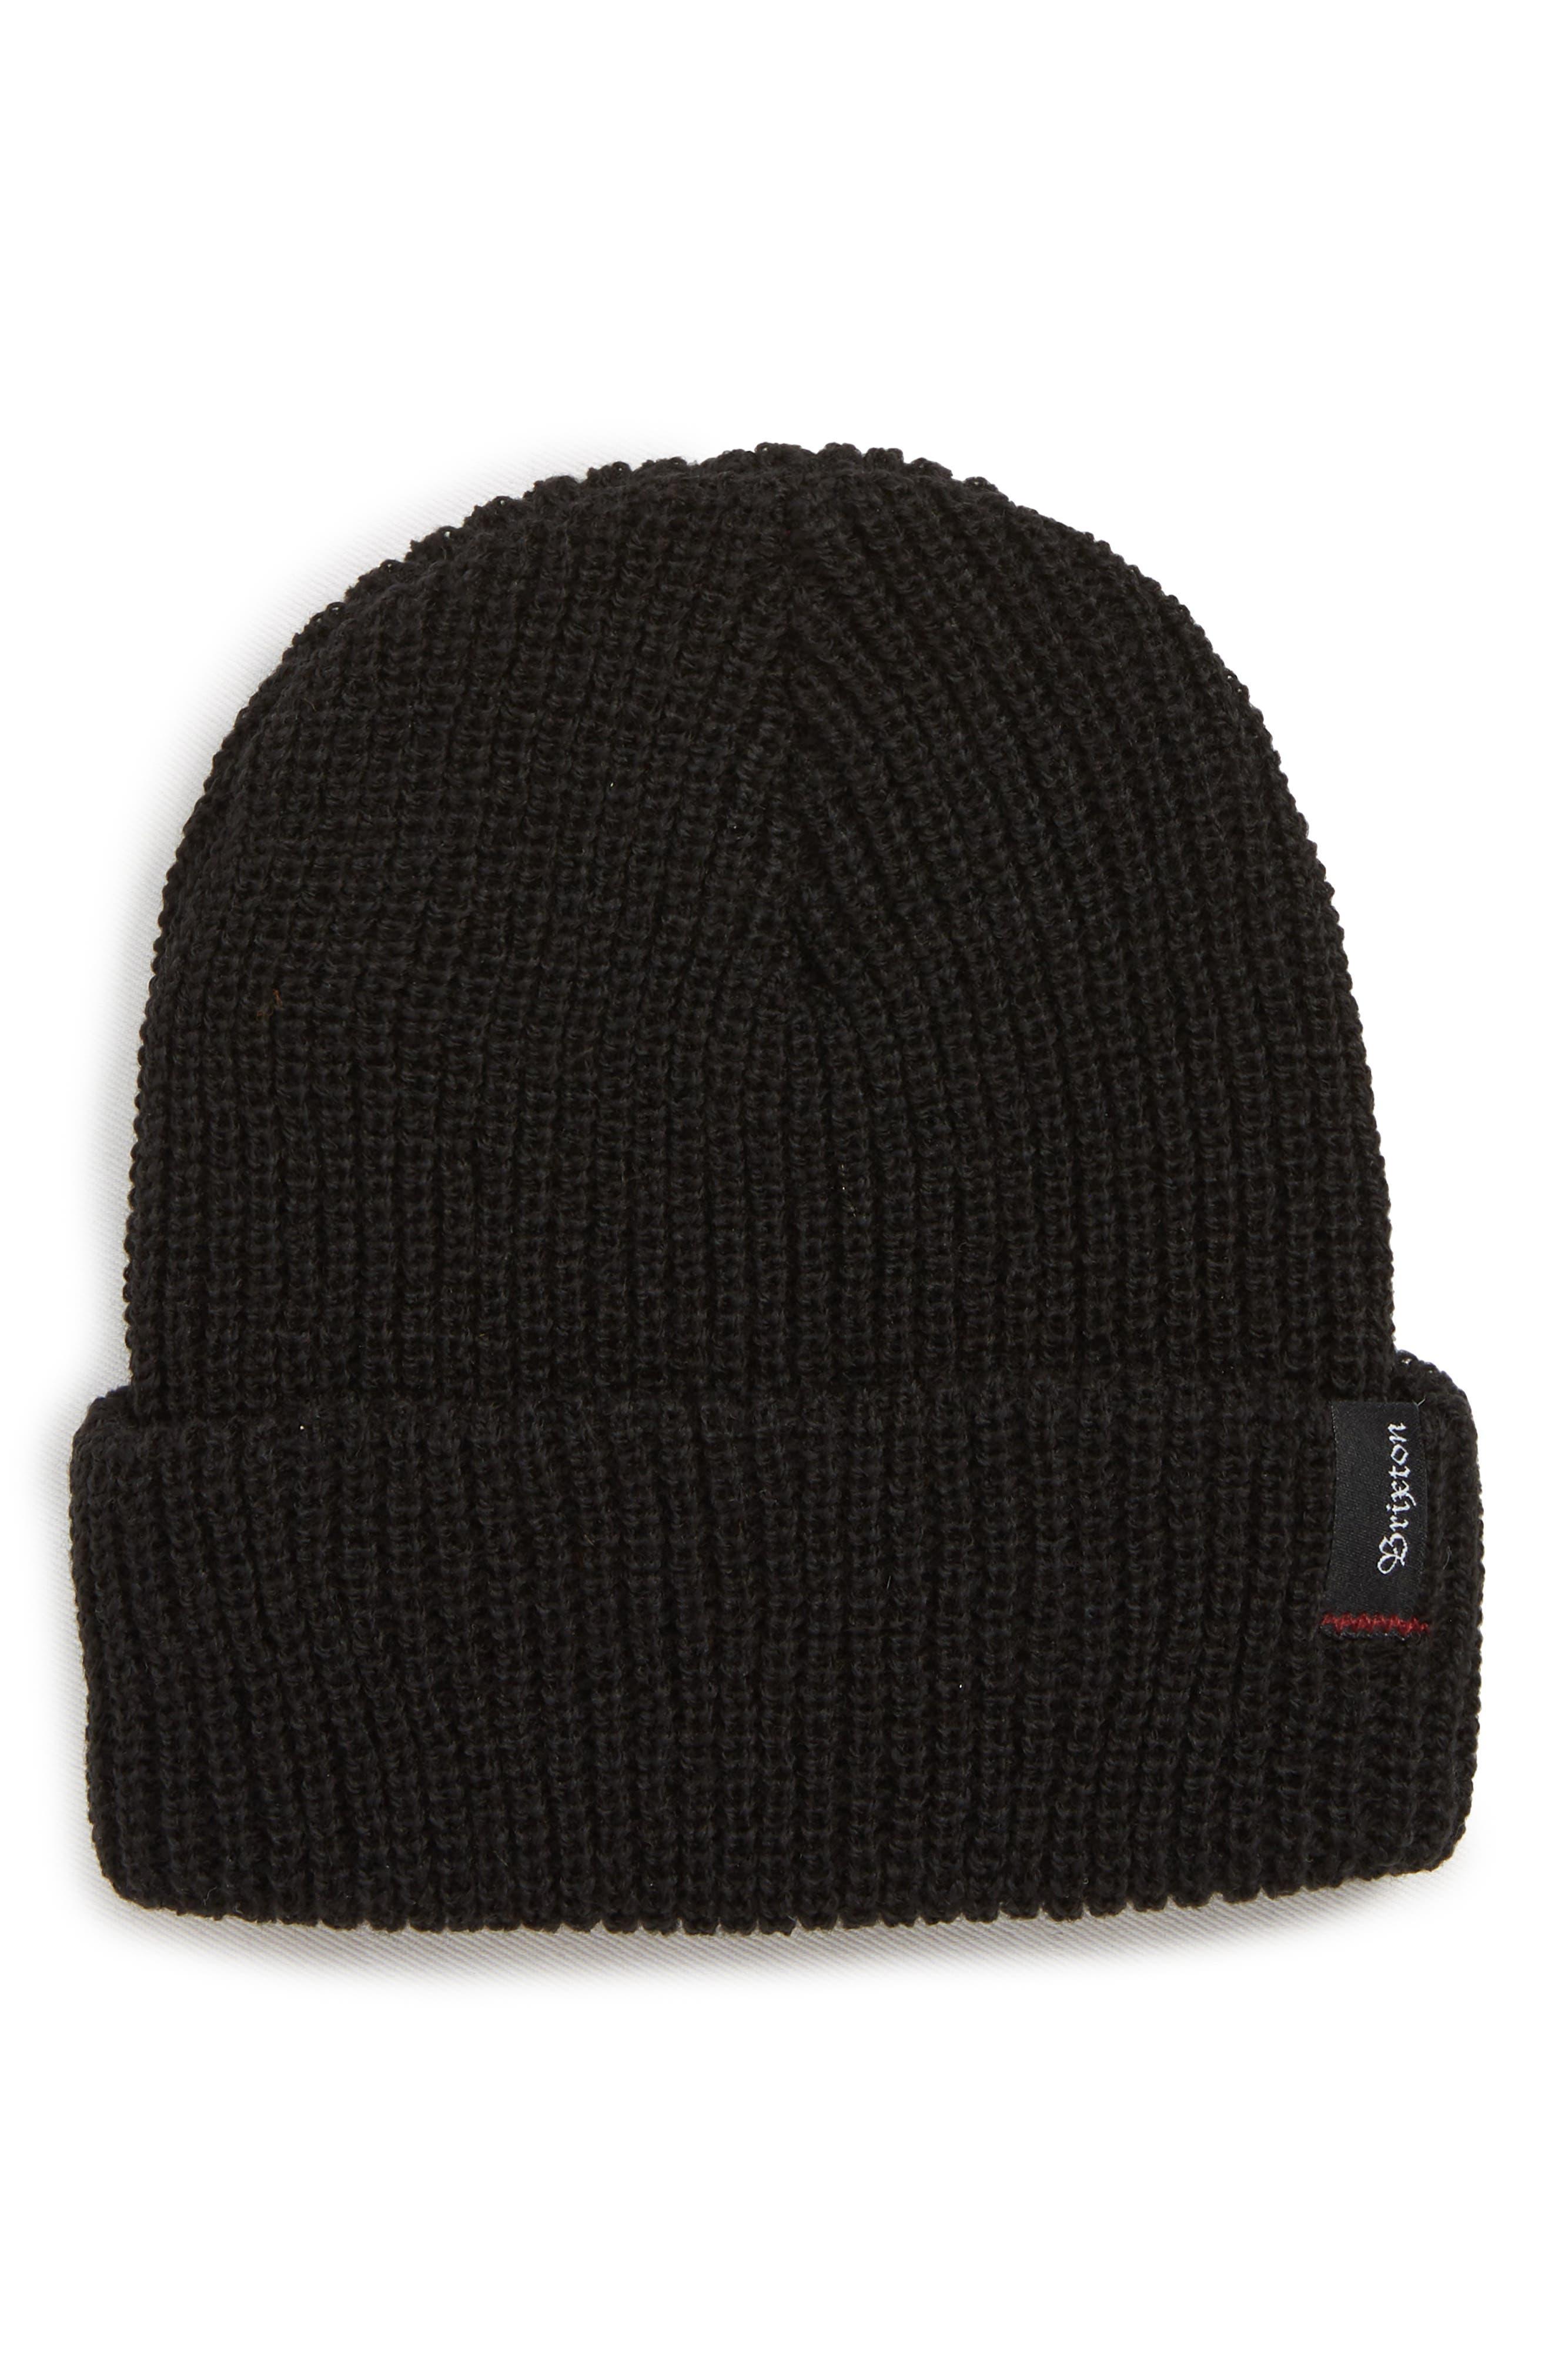 Lil Heist Beanie Hat,                         Main,                         color, 001